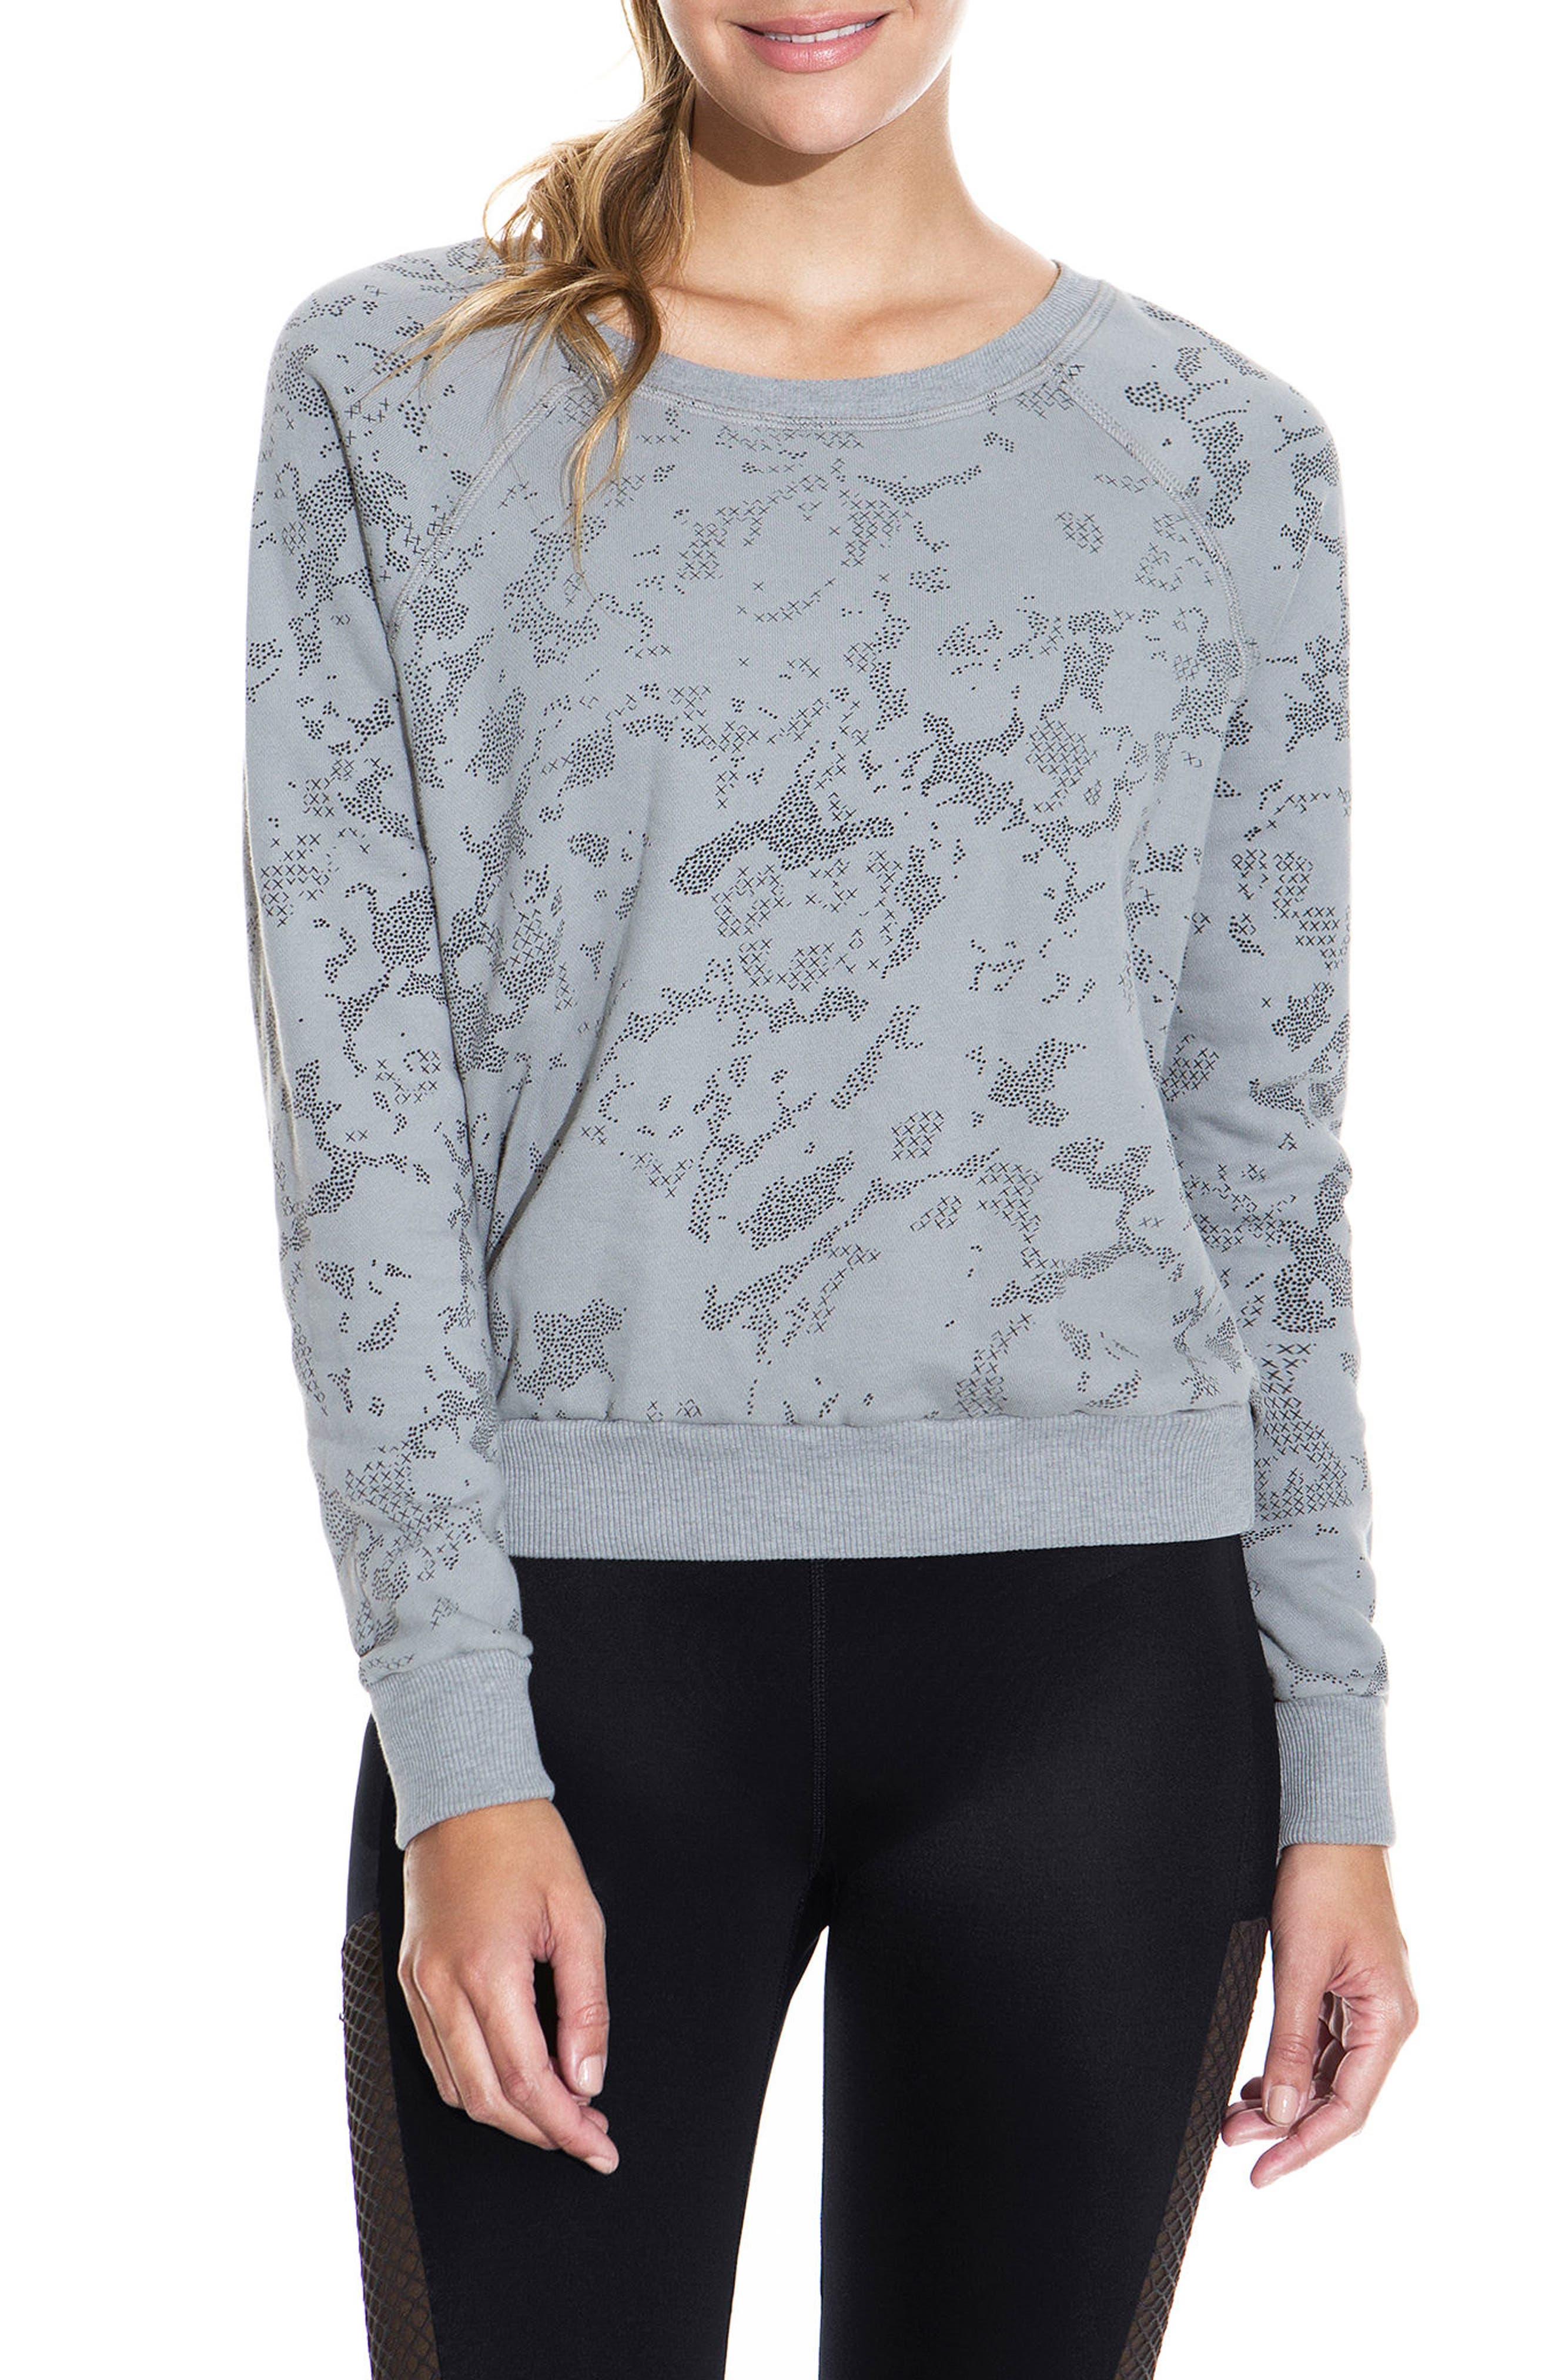 Sleek Camo Granite Sweatshirt,                             Main thumbnail 1, color,                             MED GRAY